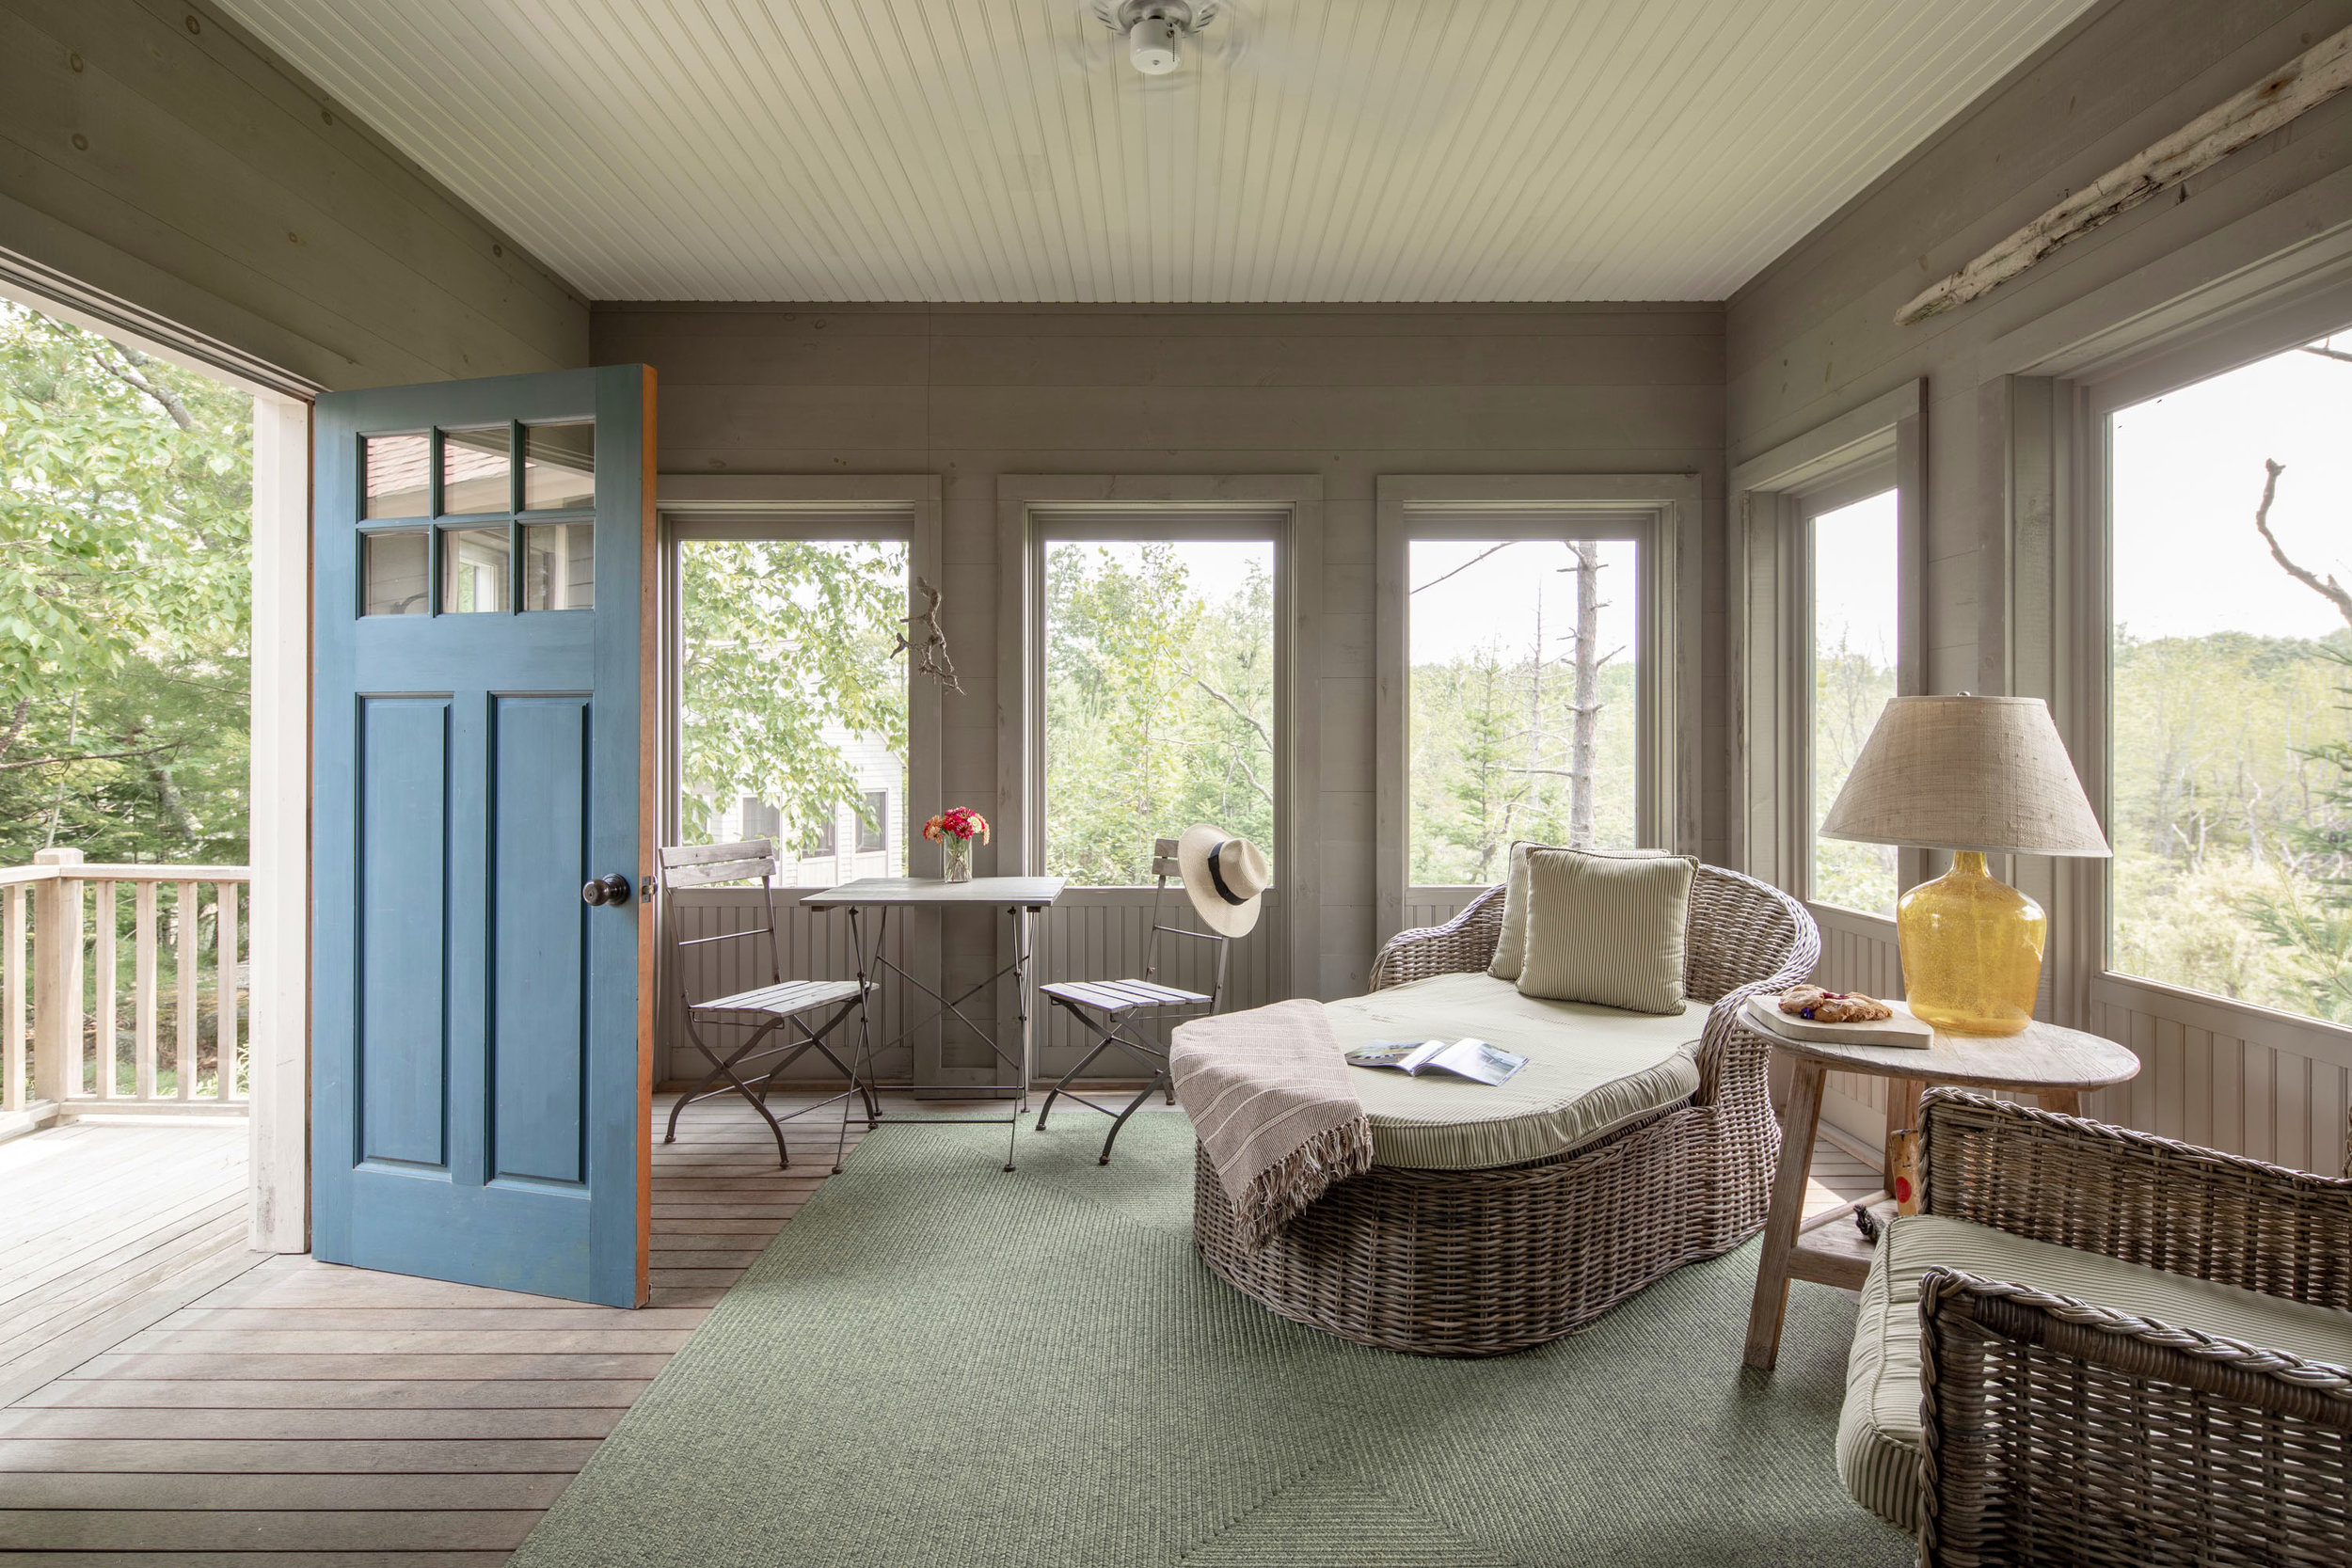 Hidden Pond Resort Hotel and Cottages Kennebunkport Maine © Heidi Kirn Photography Bungalow 15.jpg